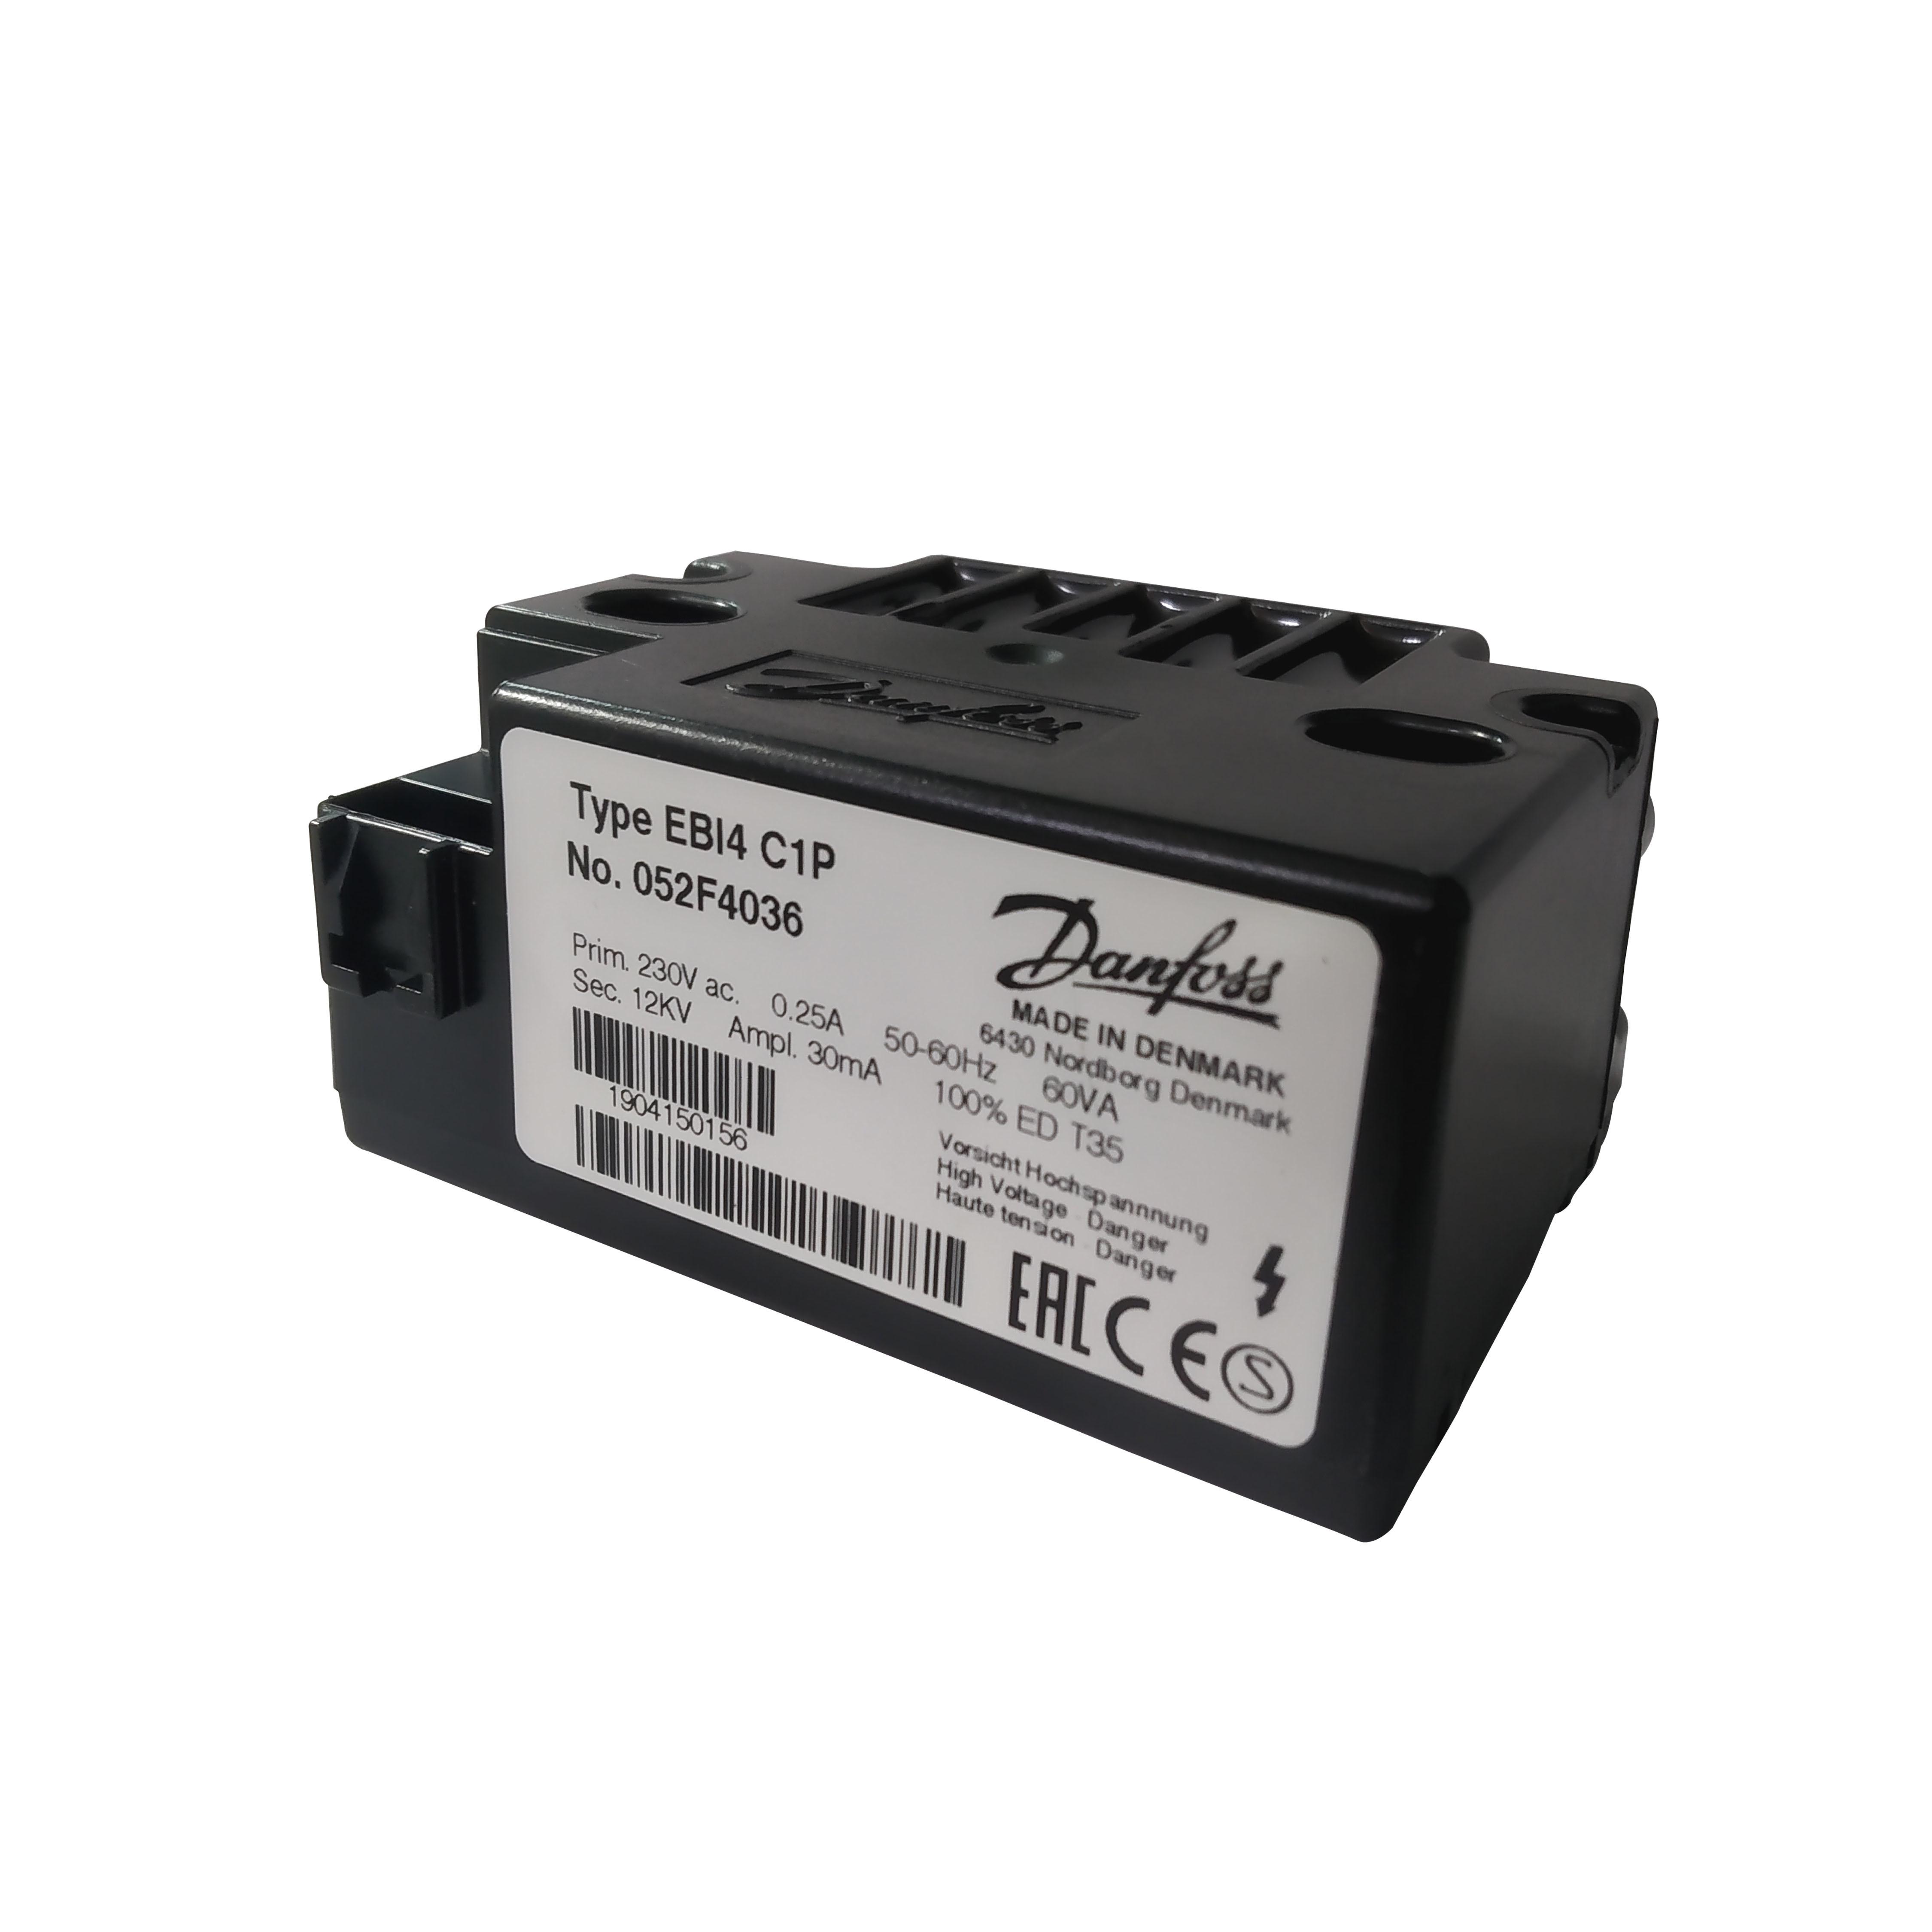 Danfoss Ebi4 C1p Ignition Transformer (052f4036)